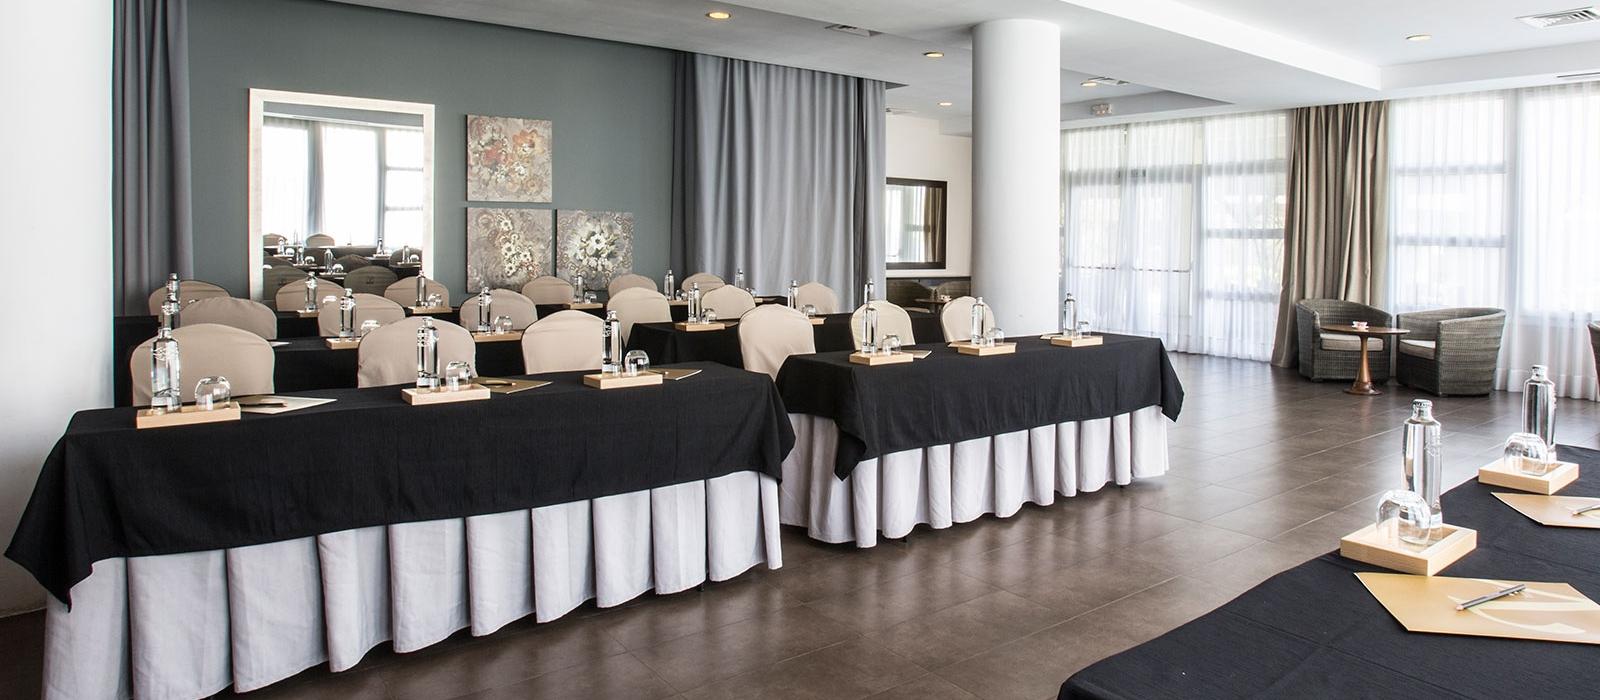 Services Hôtel Cádiz Costa Golf - Vincci Hoteles - Salles